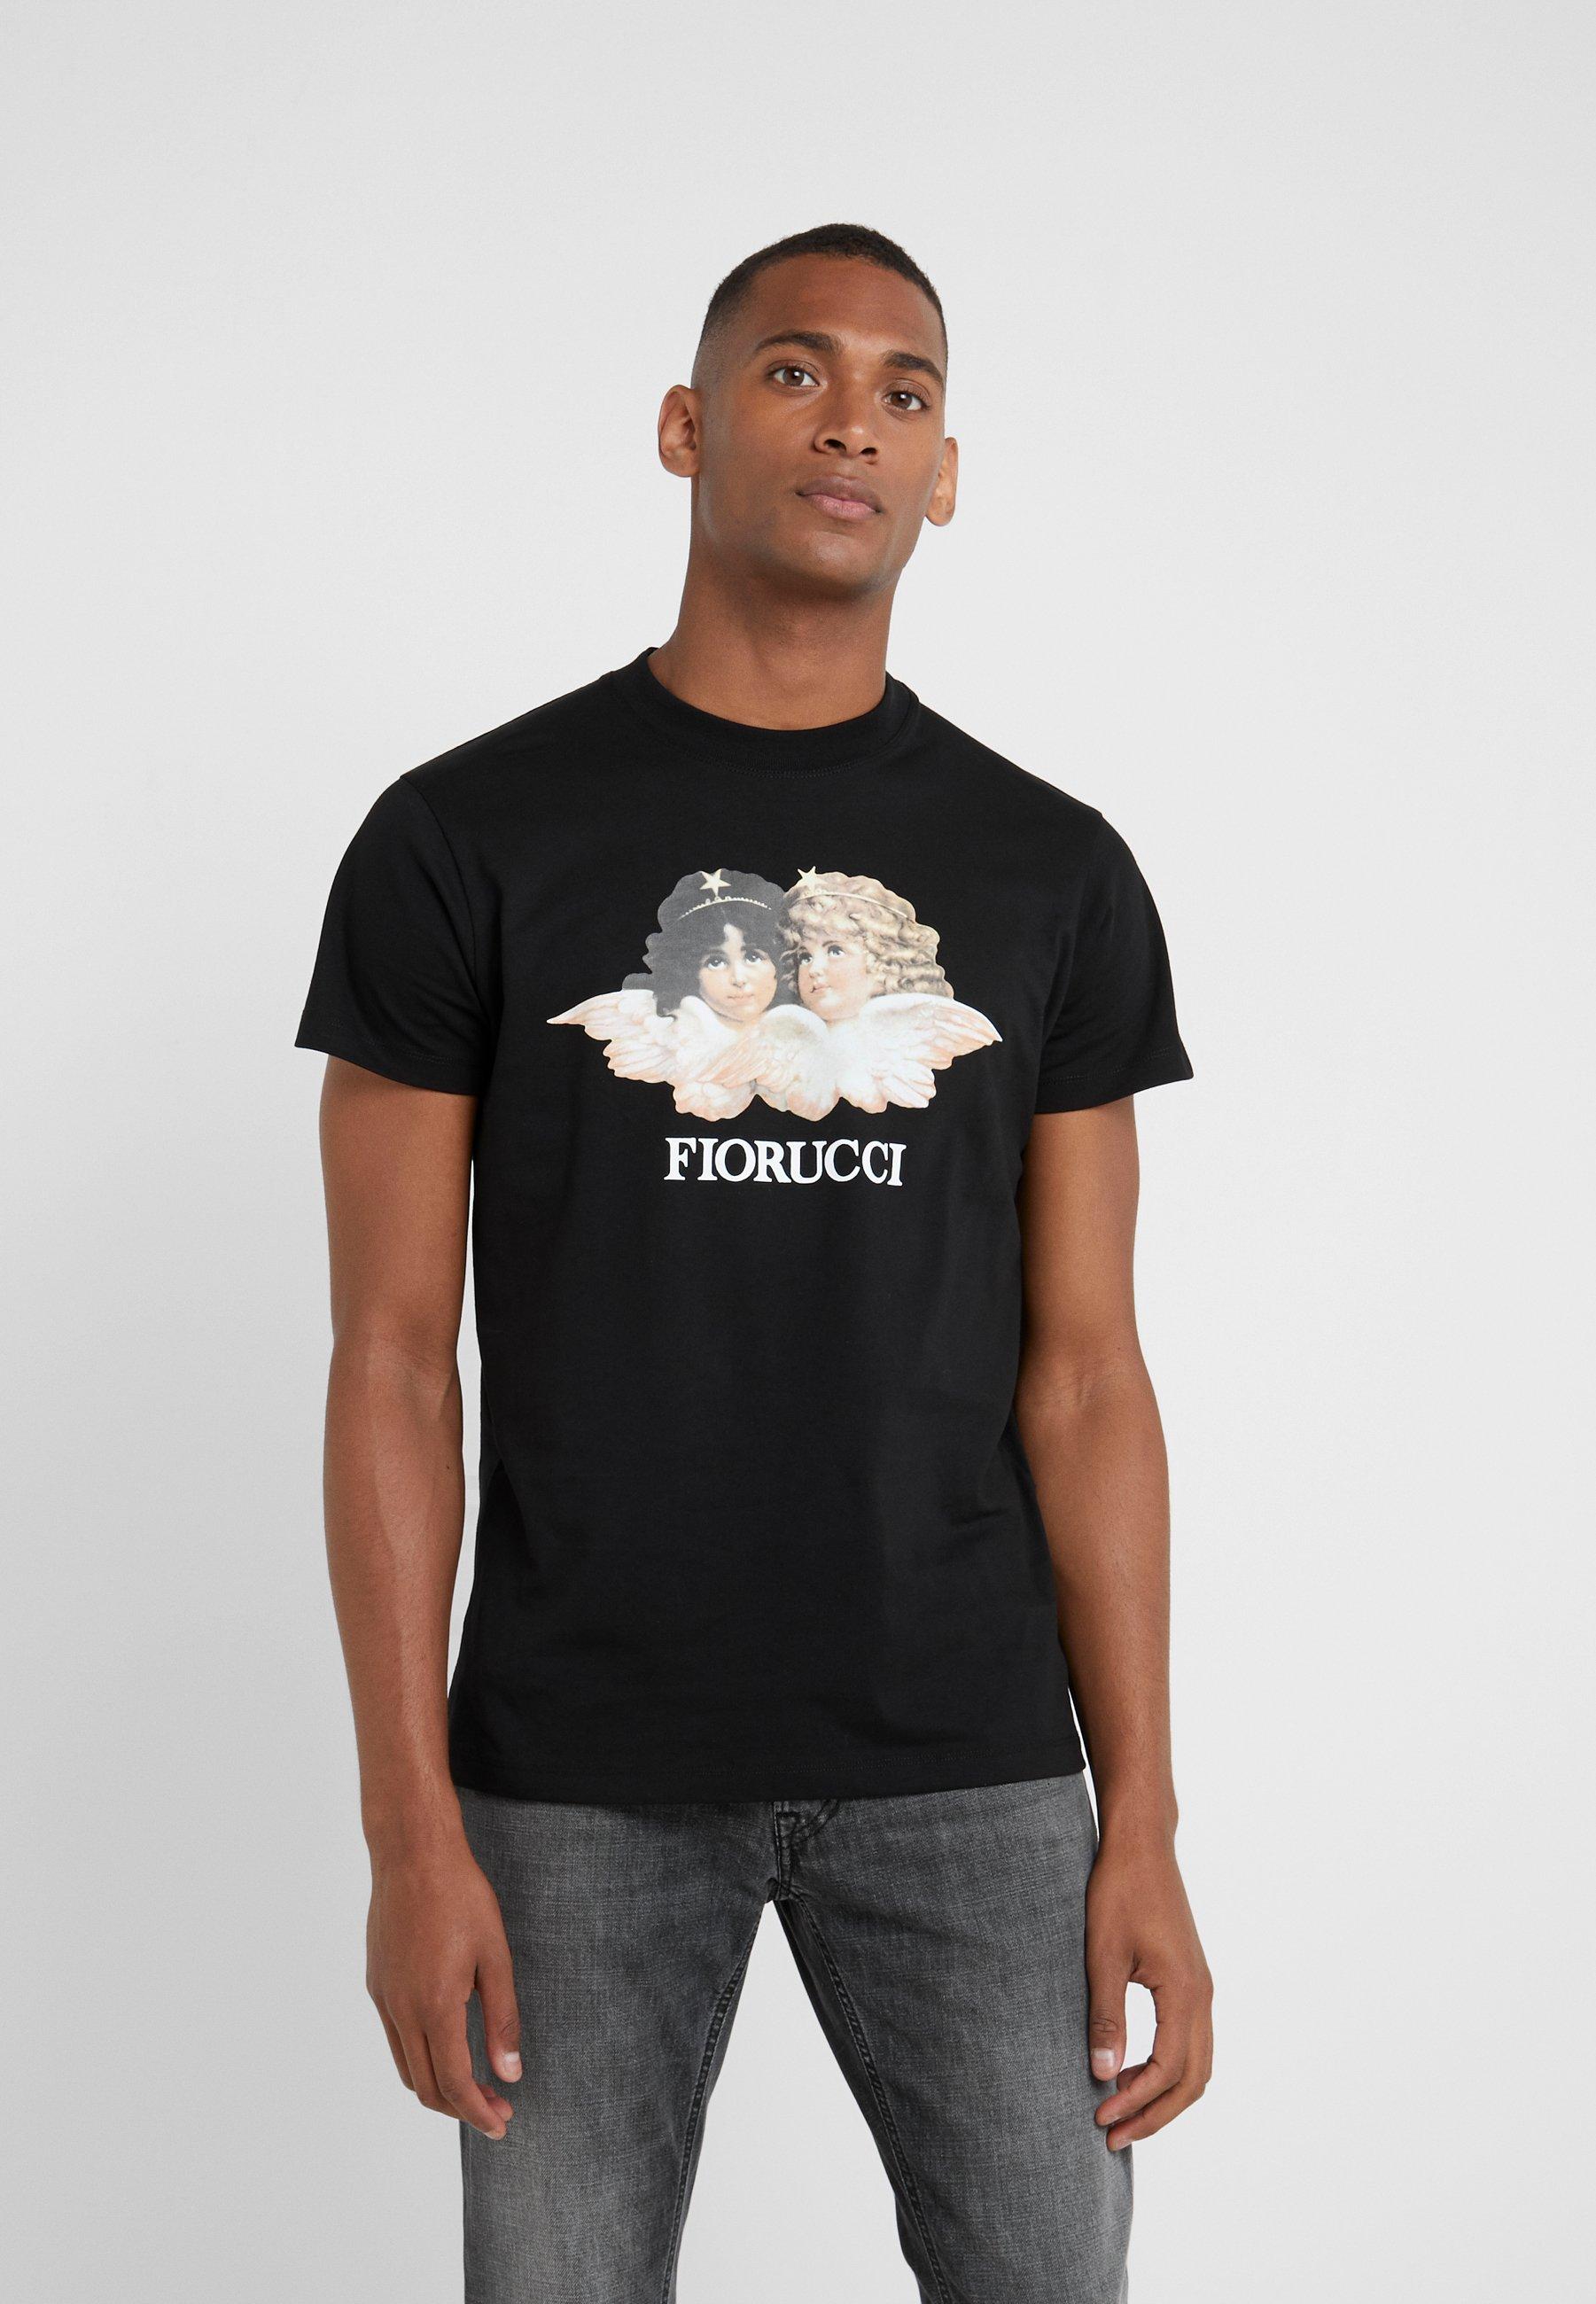 New Styles Men's Clothing Fiorucci VINTAGE ANGELS Print T-shirt black CFHyUPRes